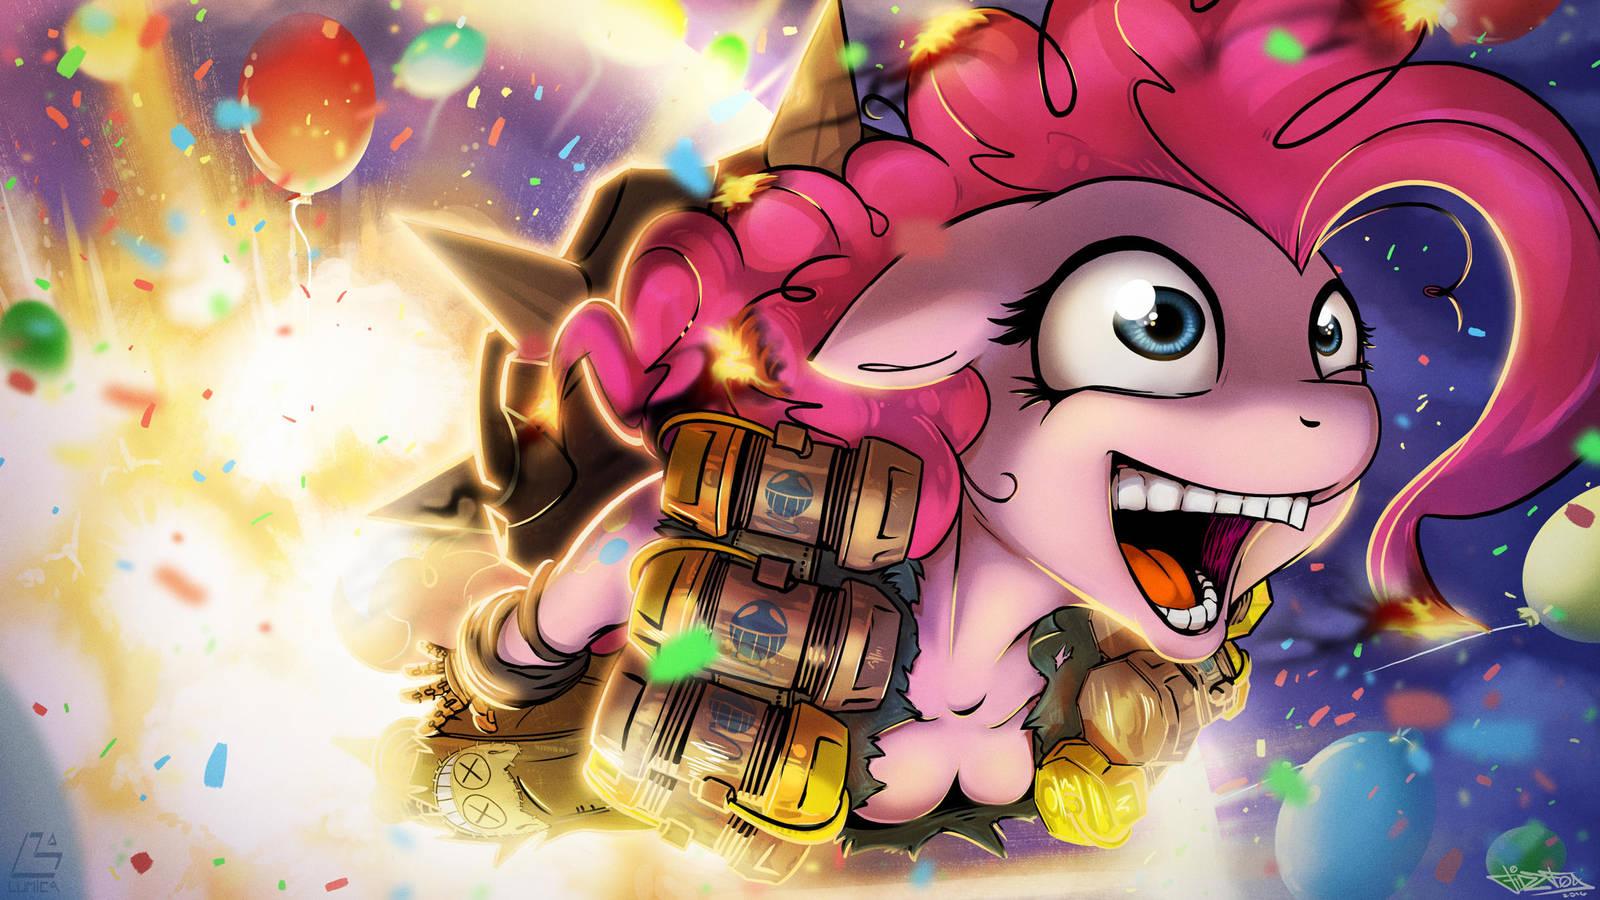 Pinkie Pie Highlight! by FidzFox